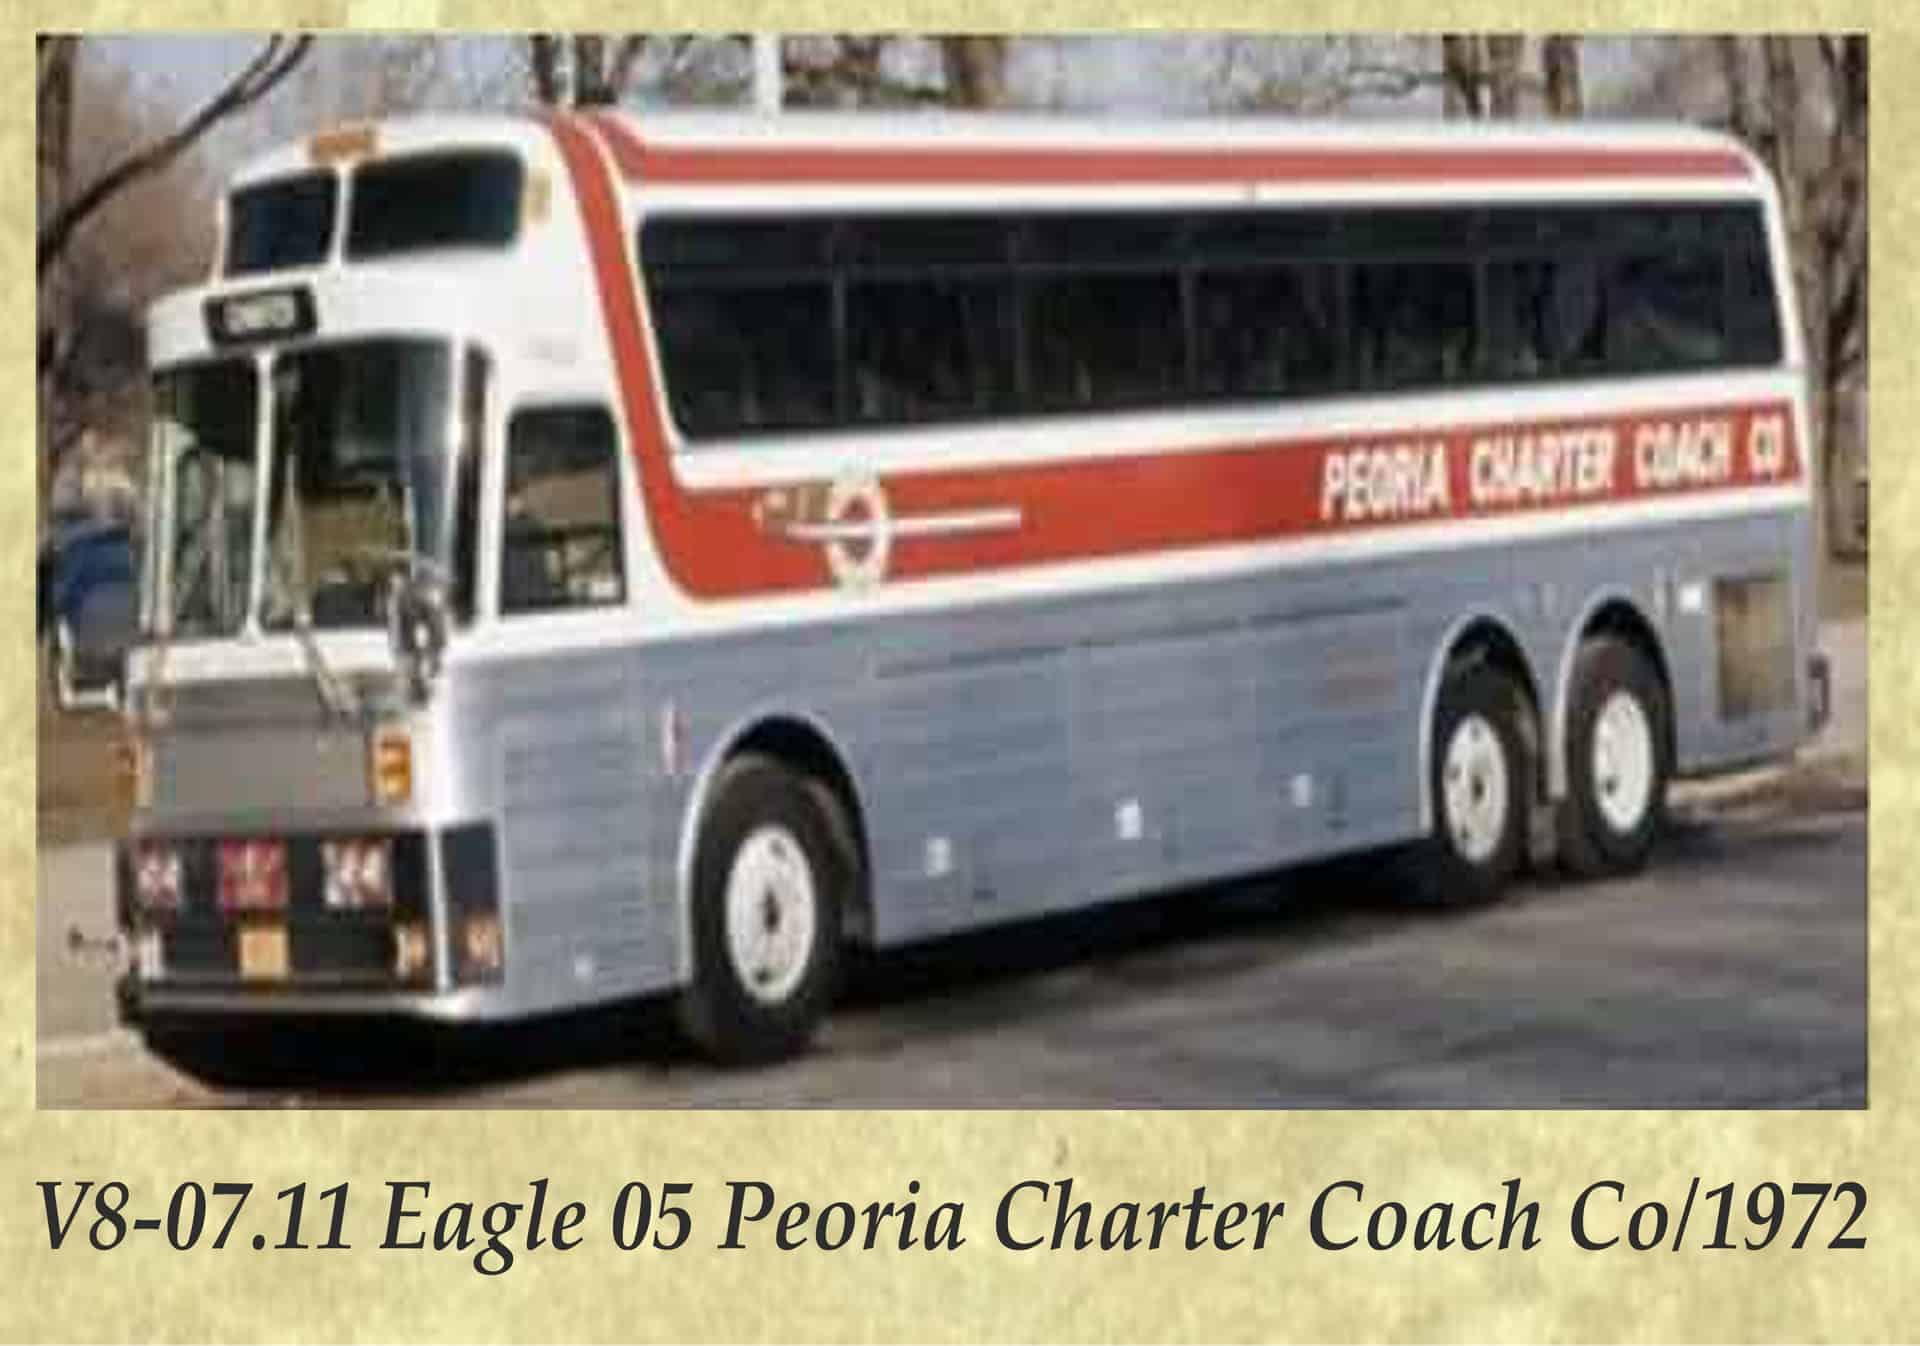 V8-07.11 Eagle 05 Peoria Charter Coach Co 1972